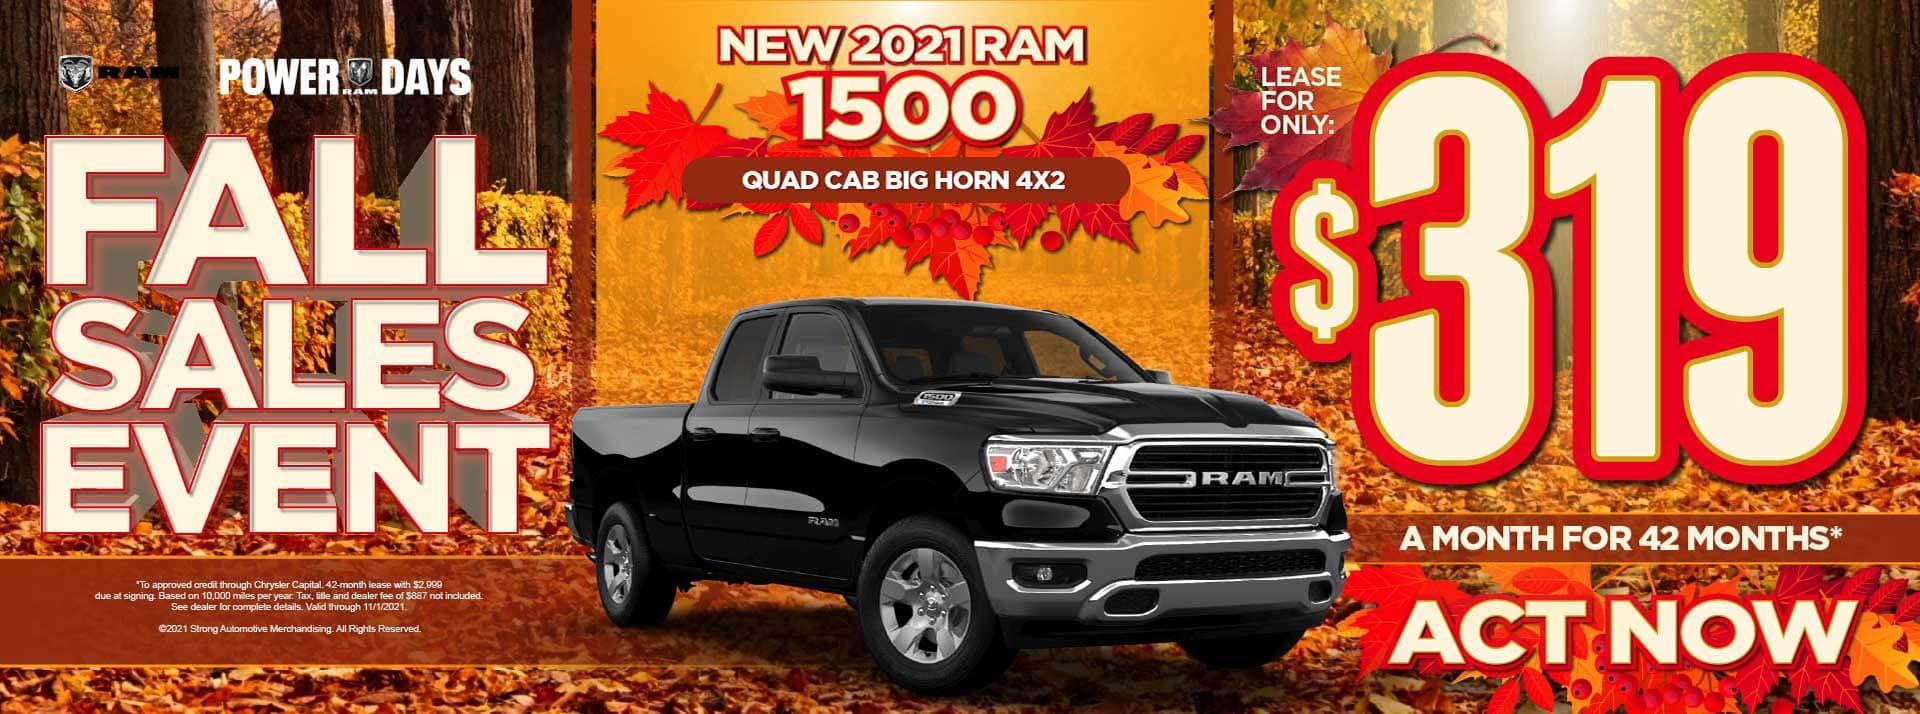 New 2021 Ram 1500 Quad Cab Big Horn 4x2 – $319 / mo - ACT NOW